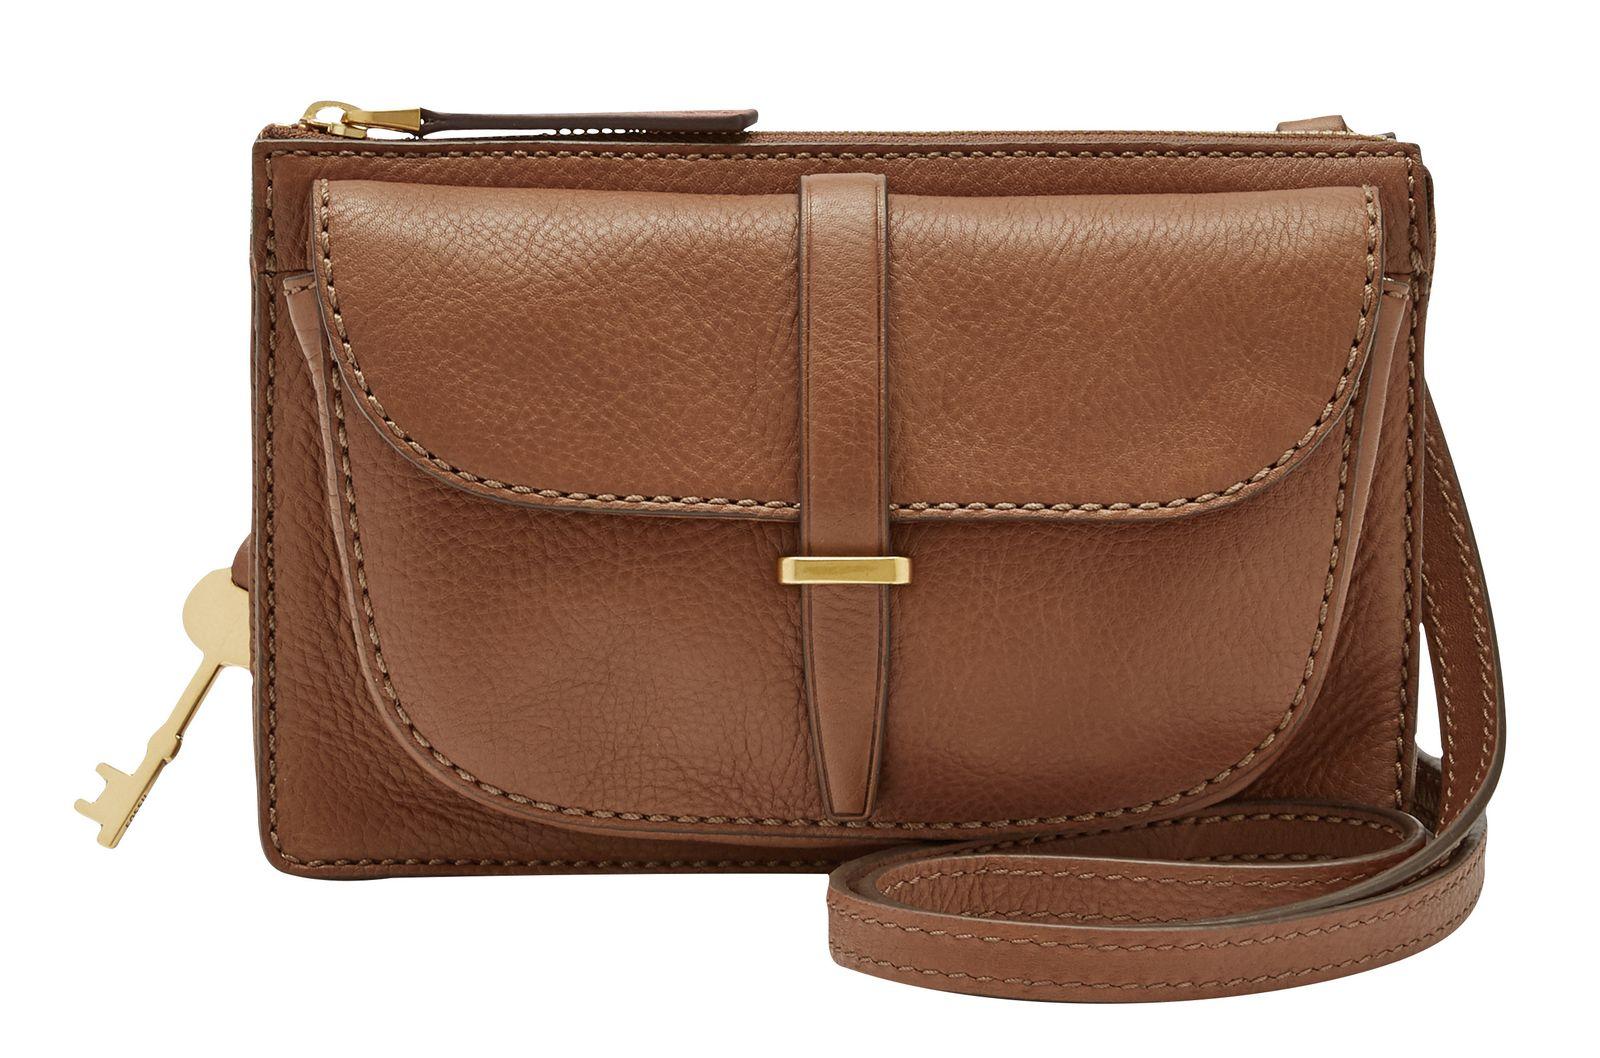 896eb56236 FOSSIL Cross Body Bag Ryder Small Crossbody Brown